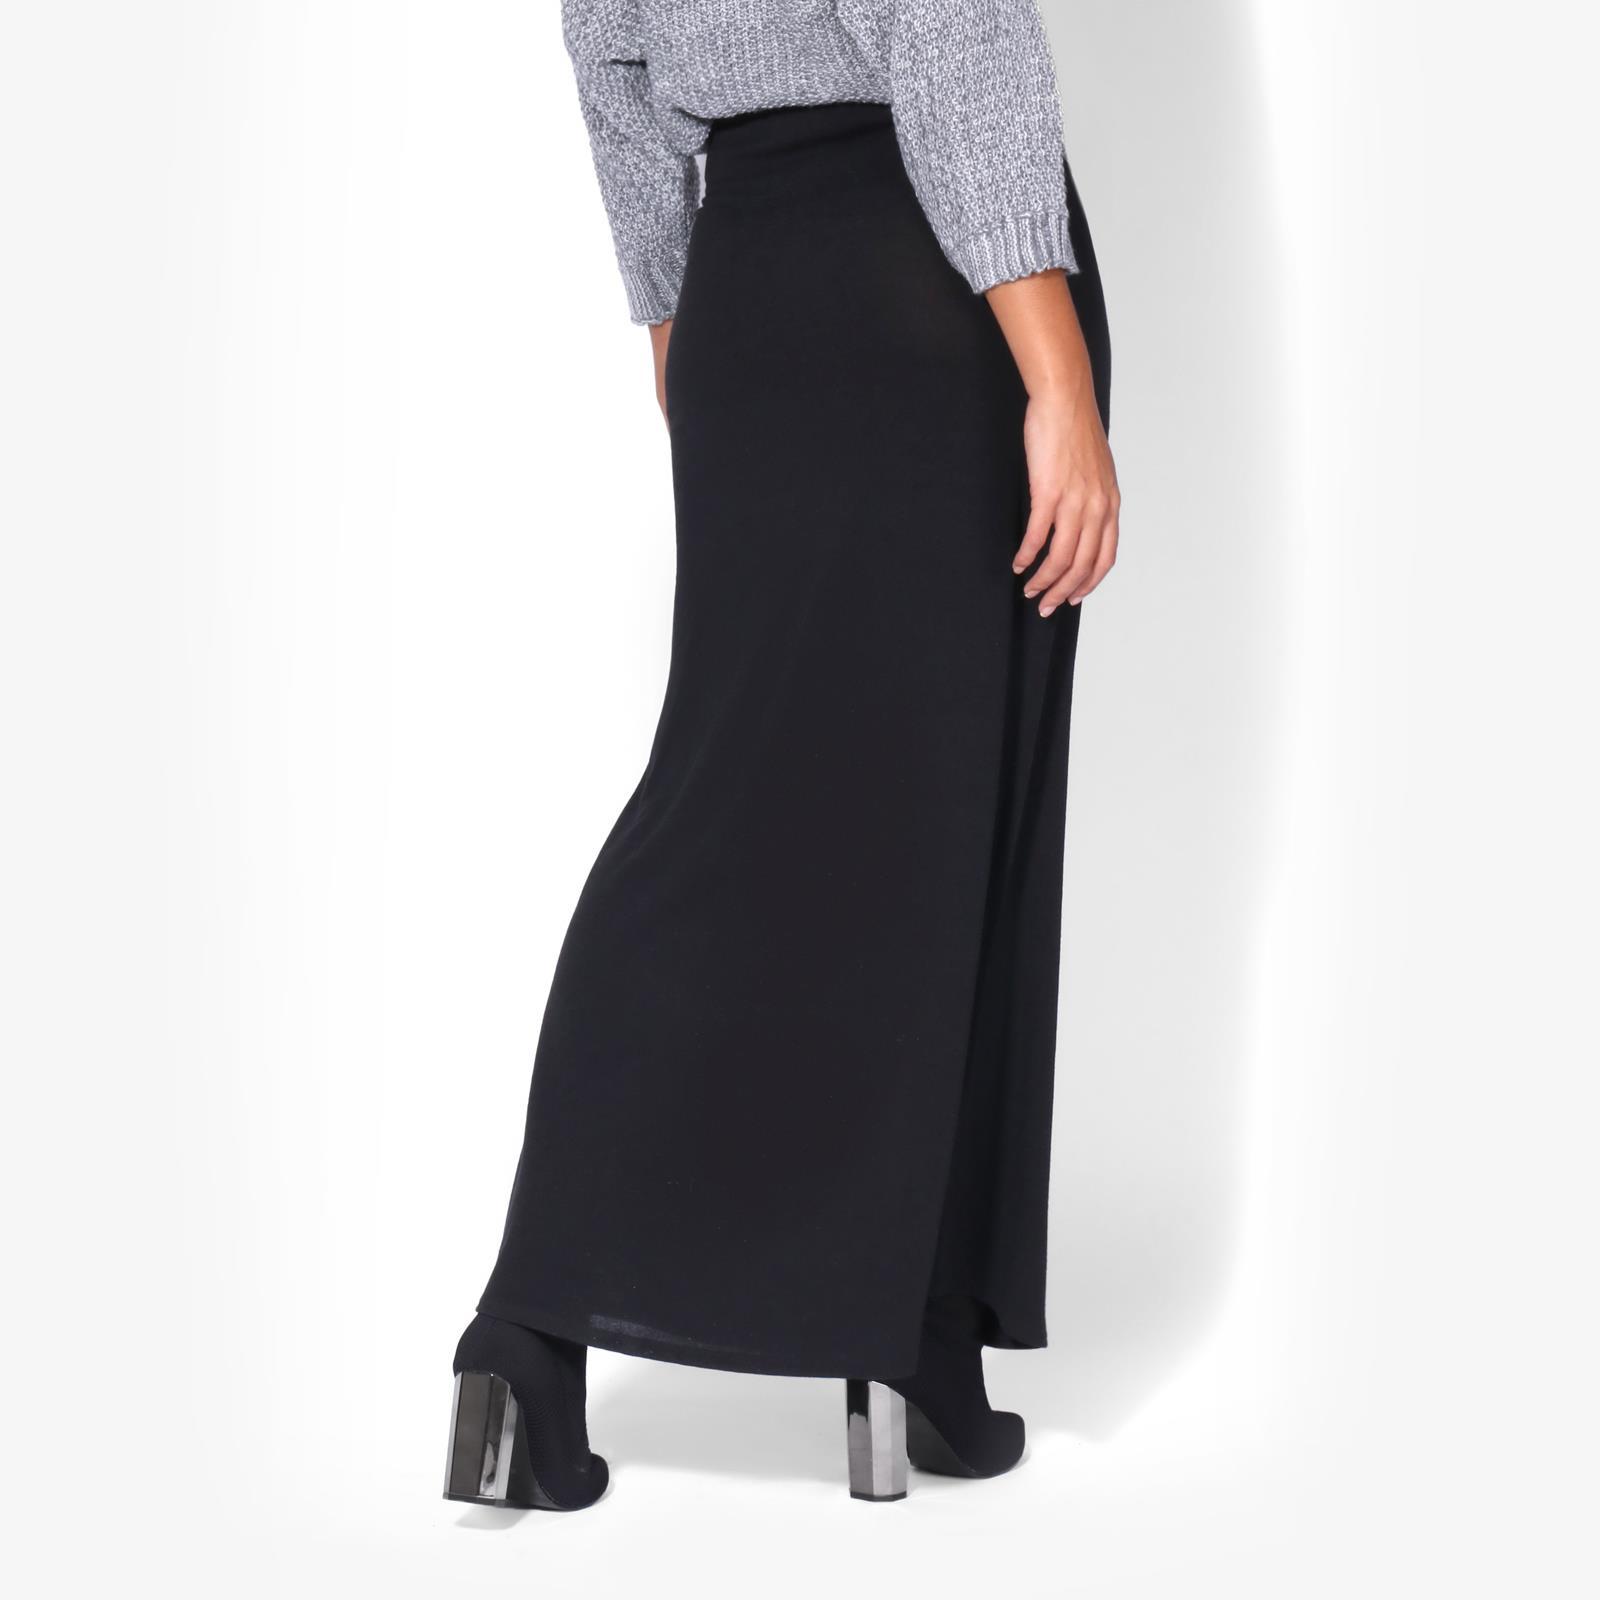 Womens-Ladies-Maxi-Skirt-High-Waist-A-Line-Long-Knit-Stretch-Bodycon-Casual-Boho thumbnail 5